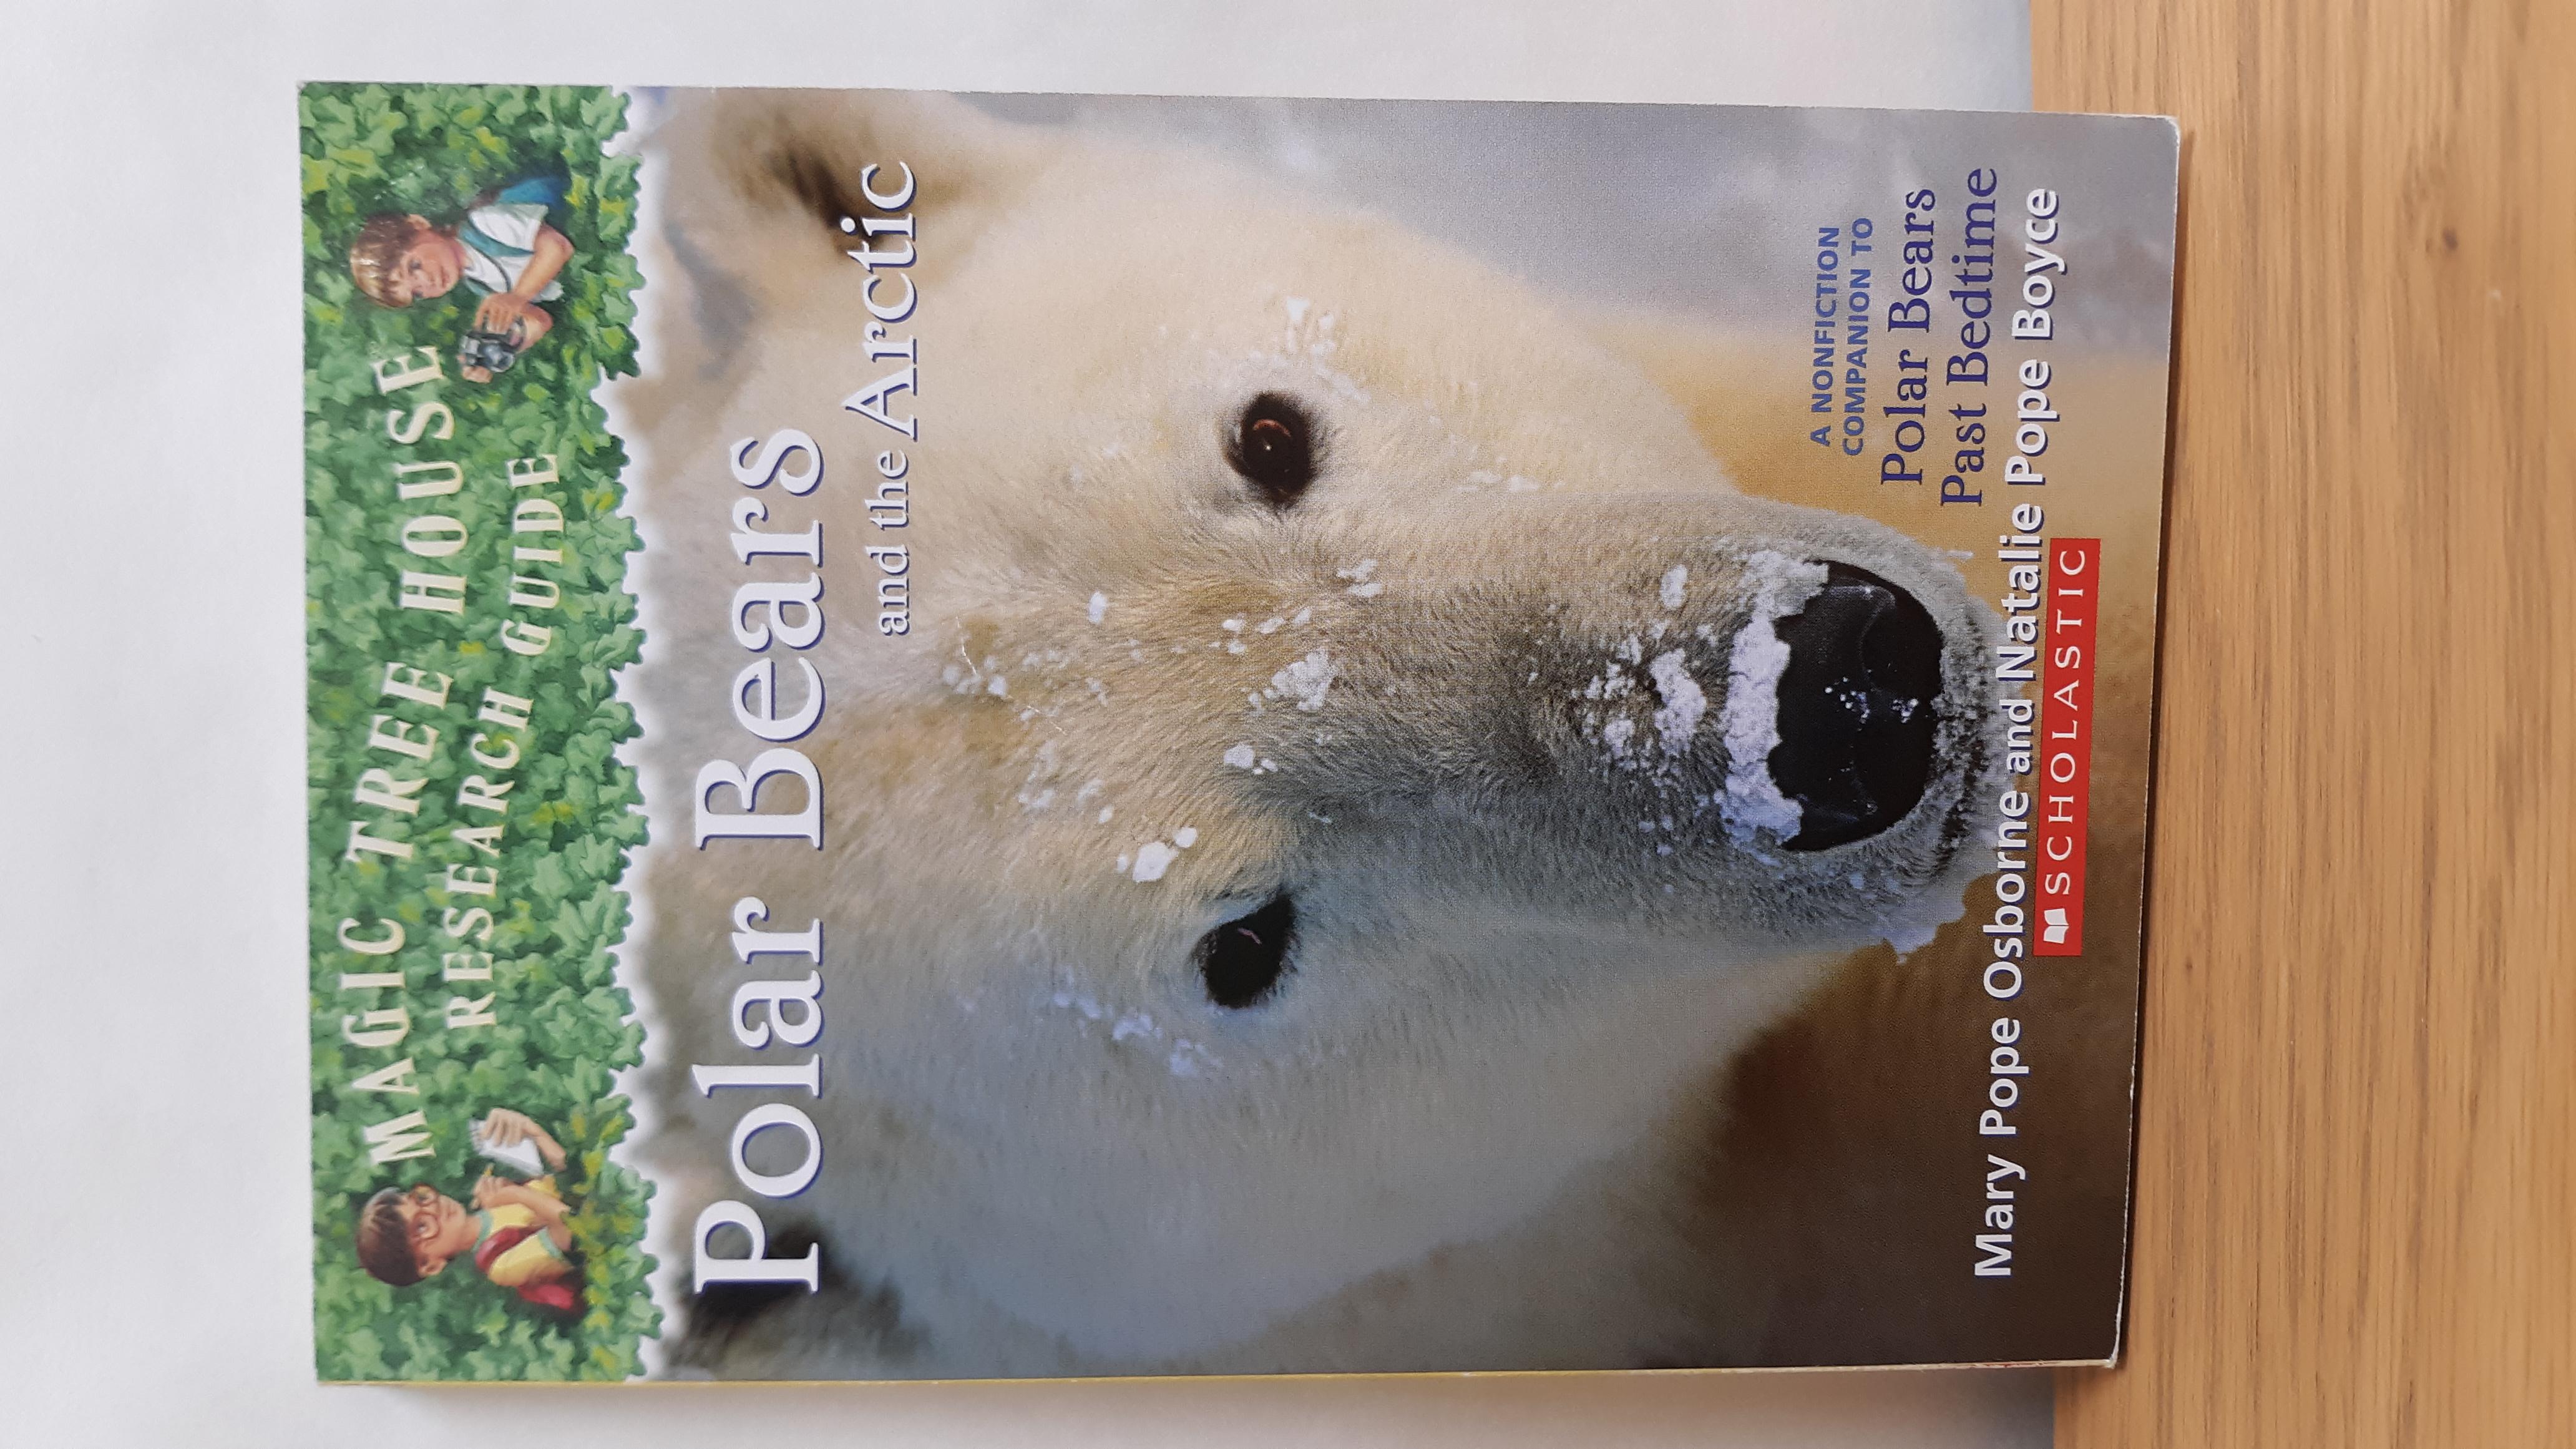 https://0201.nccdn.net/1_2/000/000/0ef/c0d/magic-tree-house-research-guide-polar-bears-and-the-arctic.jpg